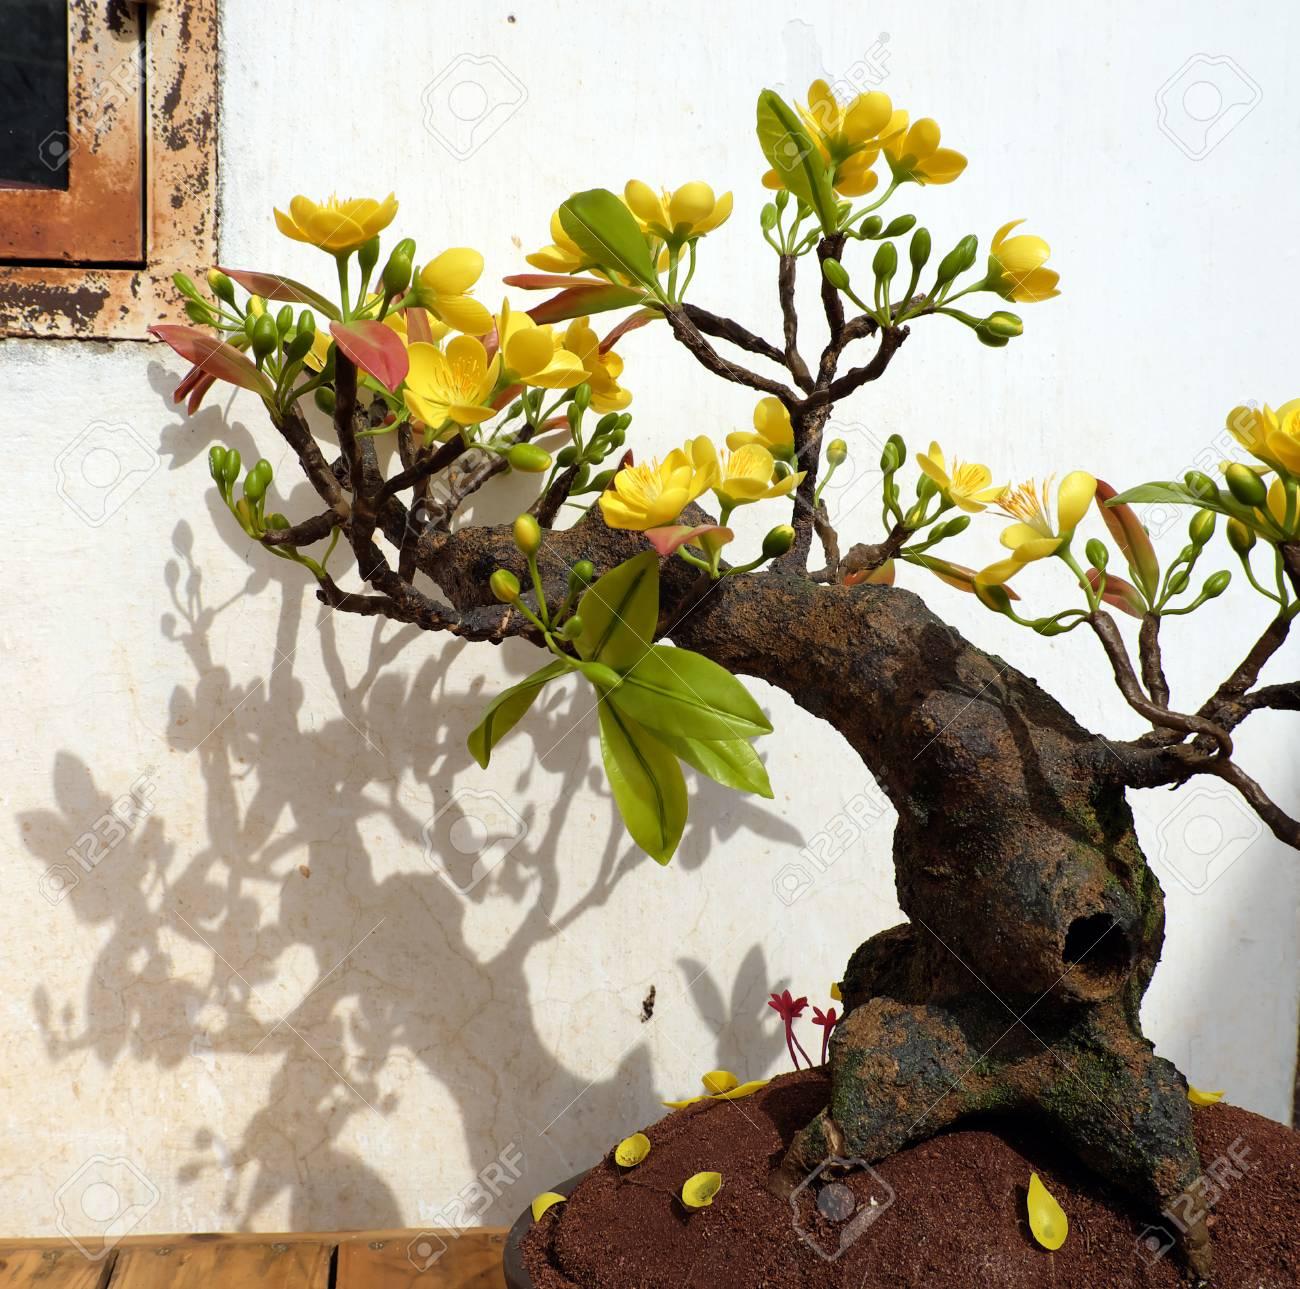 Vietnam Spring Flower For Home Decoration In Springtime Handmade